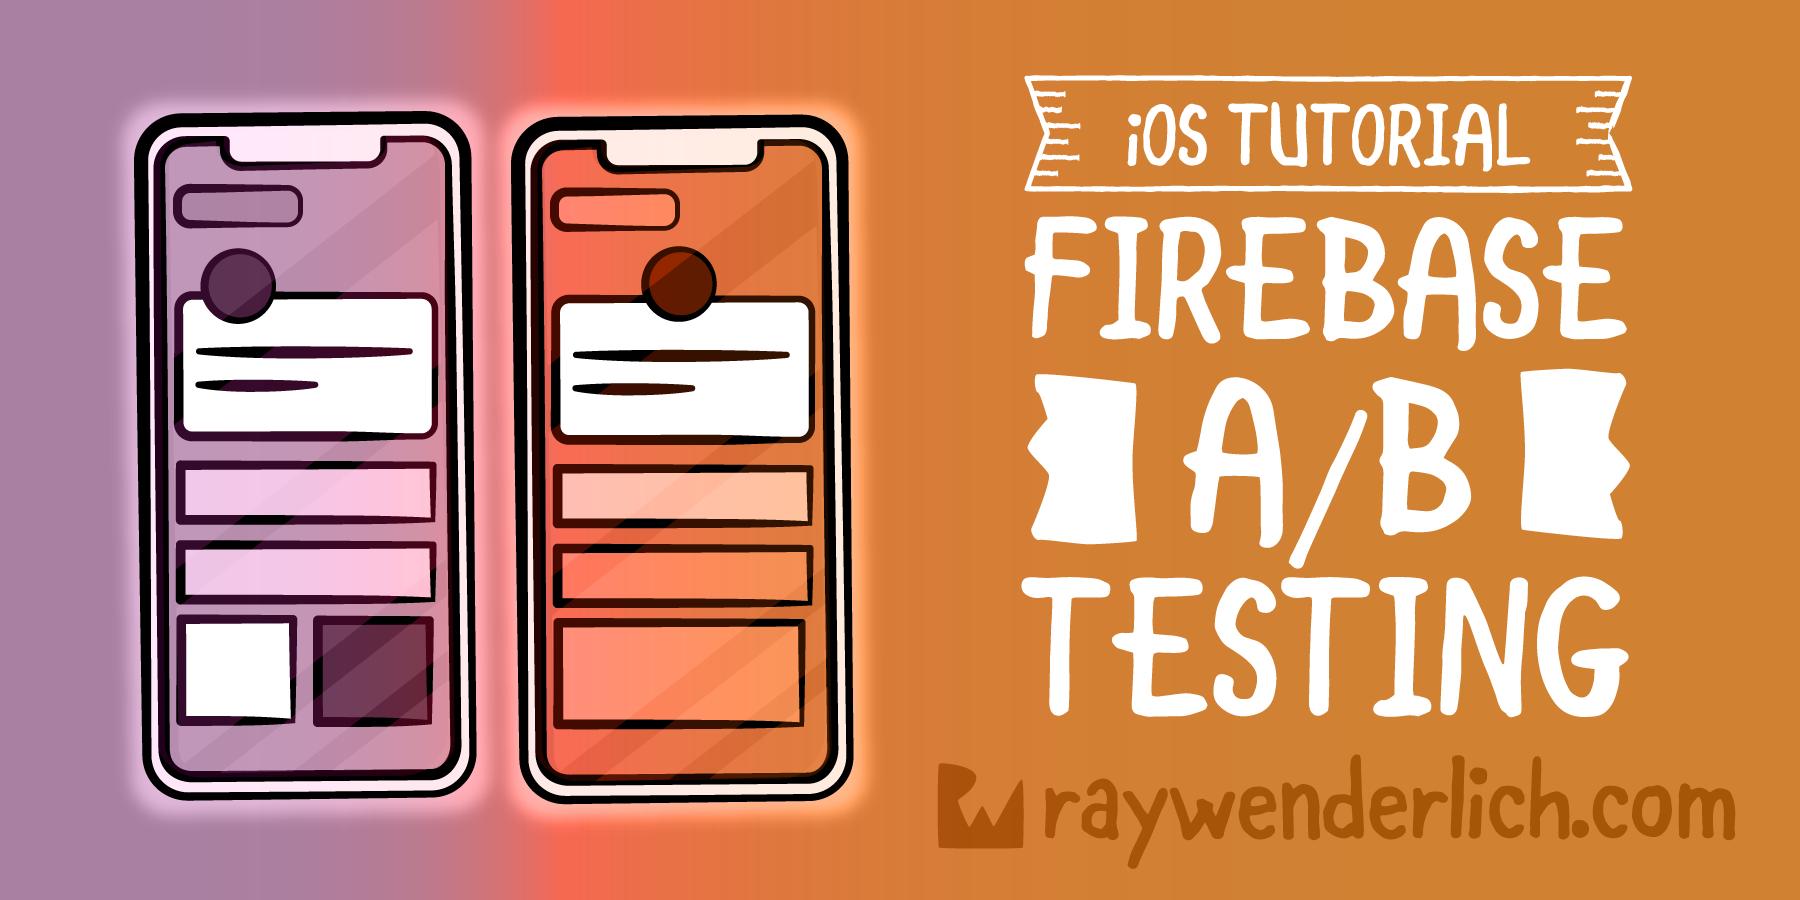 Firebase Tutorial: iOS A/B Testing [FREE]